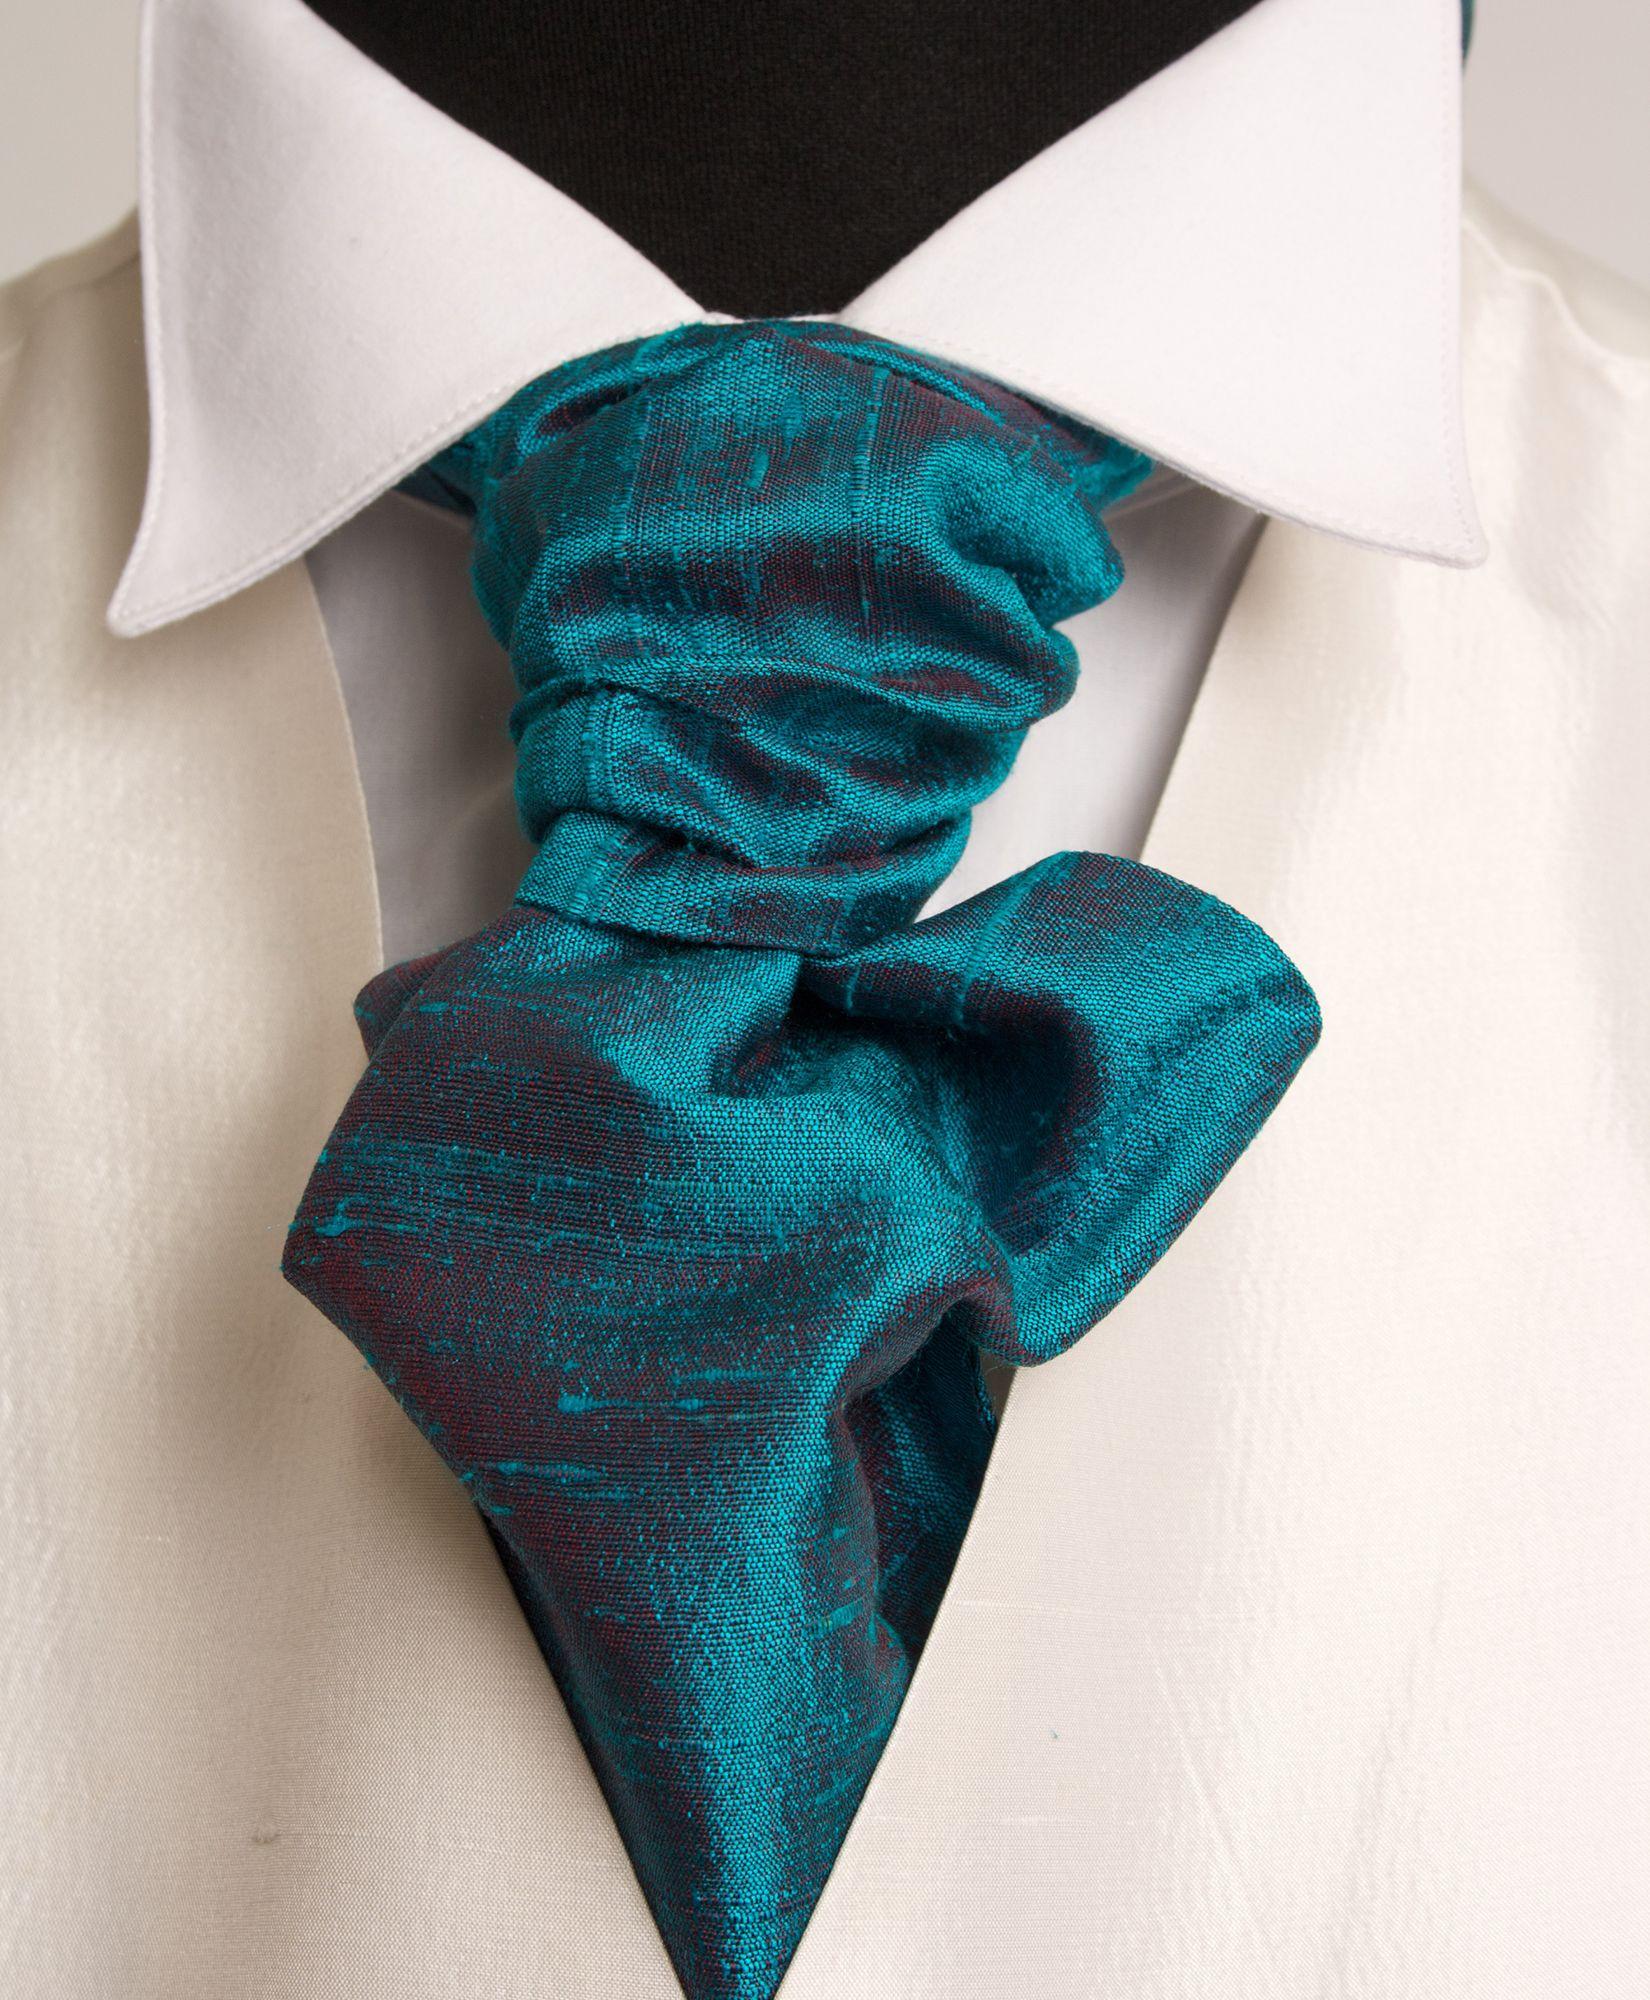 teal cravat - Google Search | Menswear | Pinterest | Teal, Woodland ...